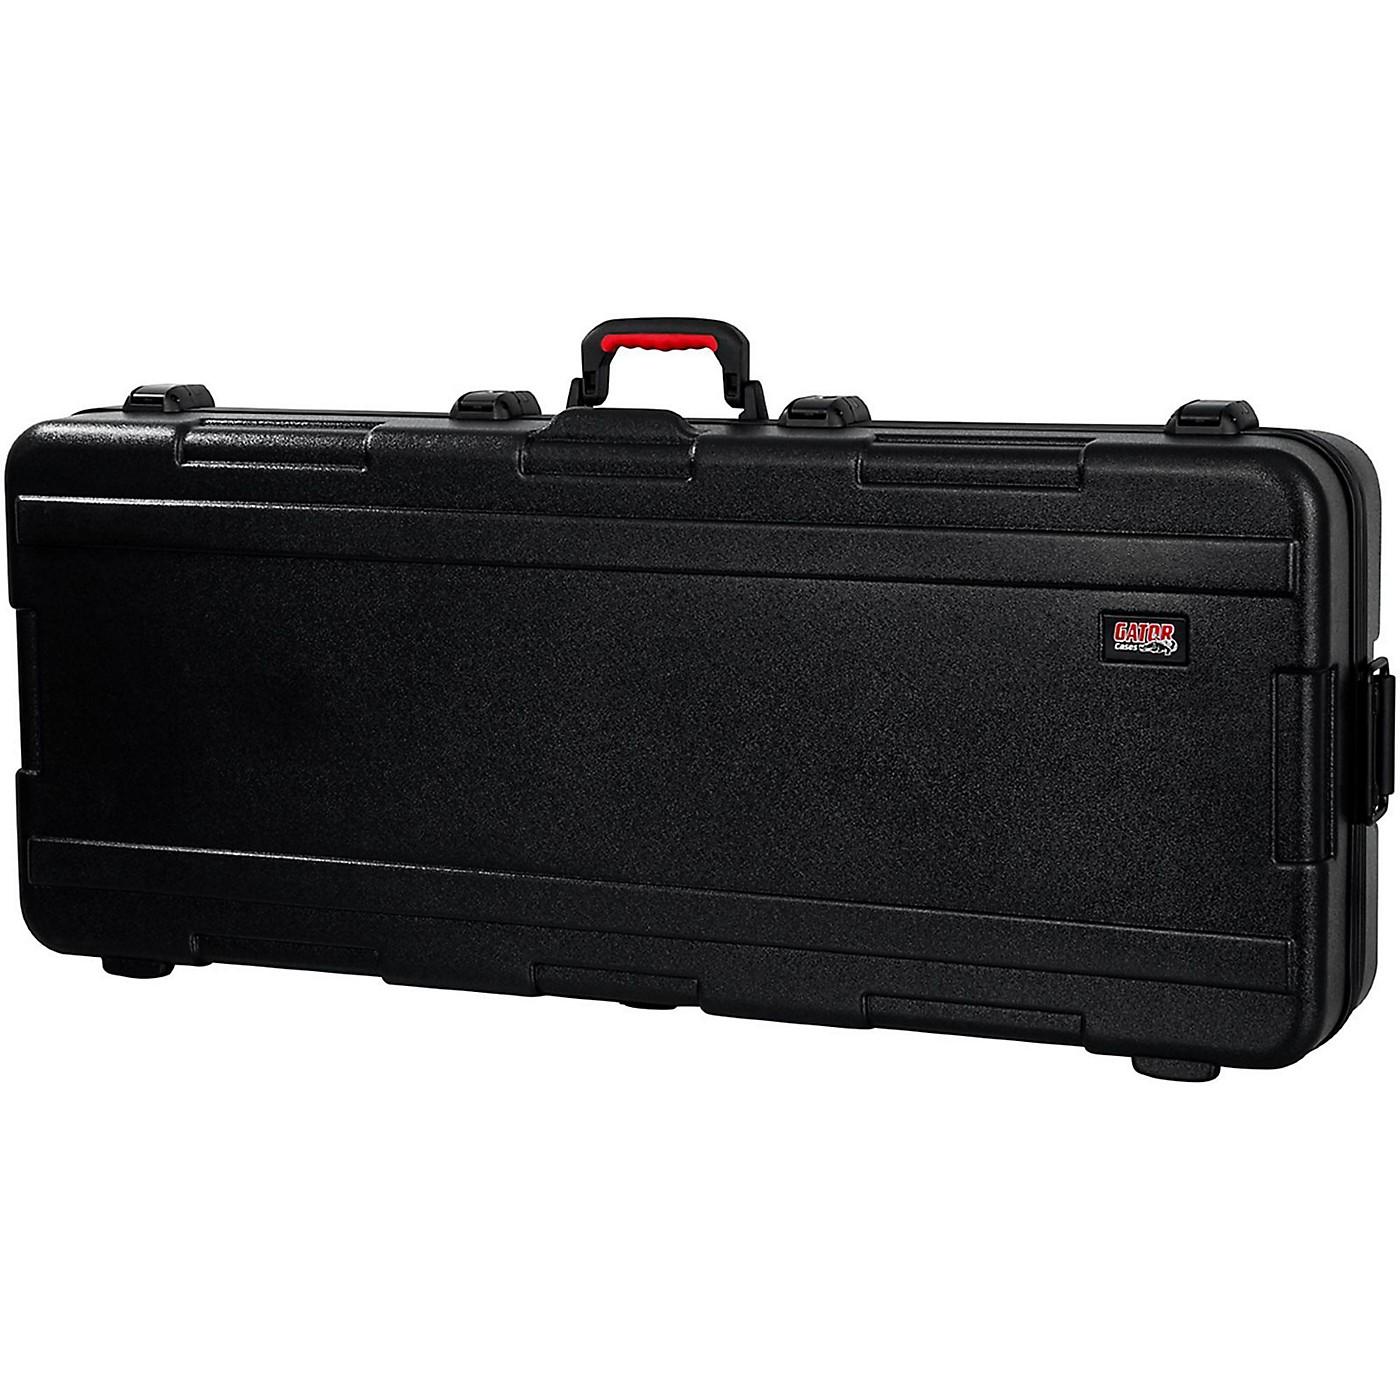 Gator TSA ATA Slim XL 88-Note Keyboard Case with Wheels thumbnail